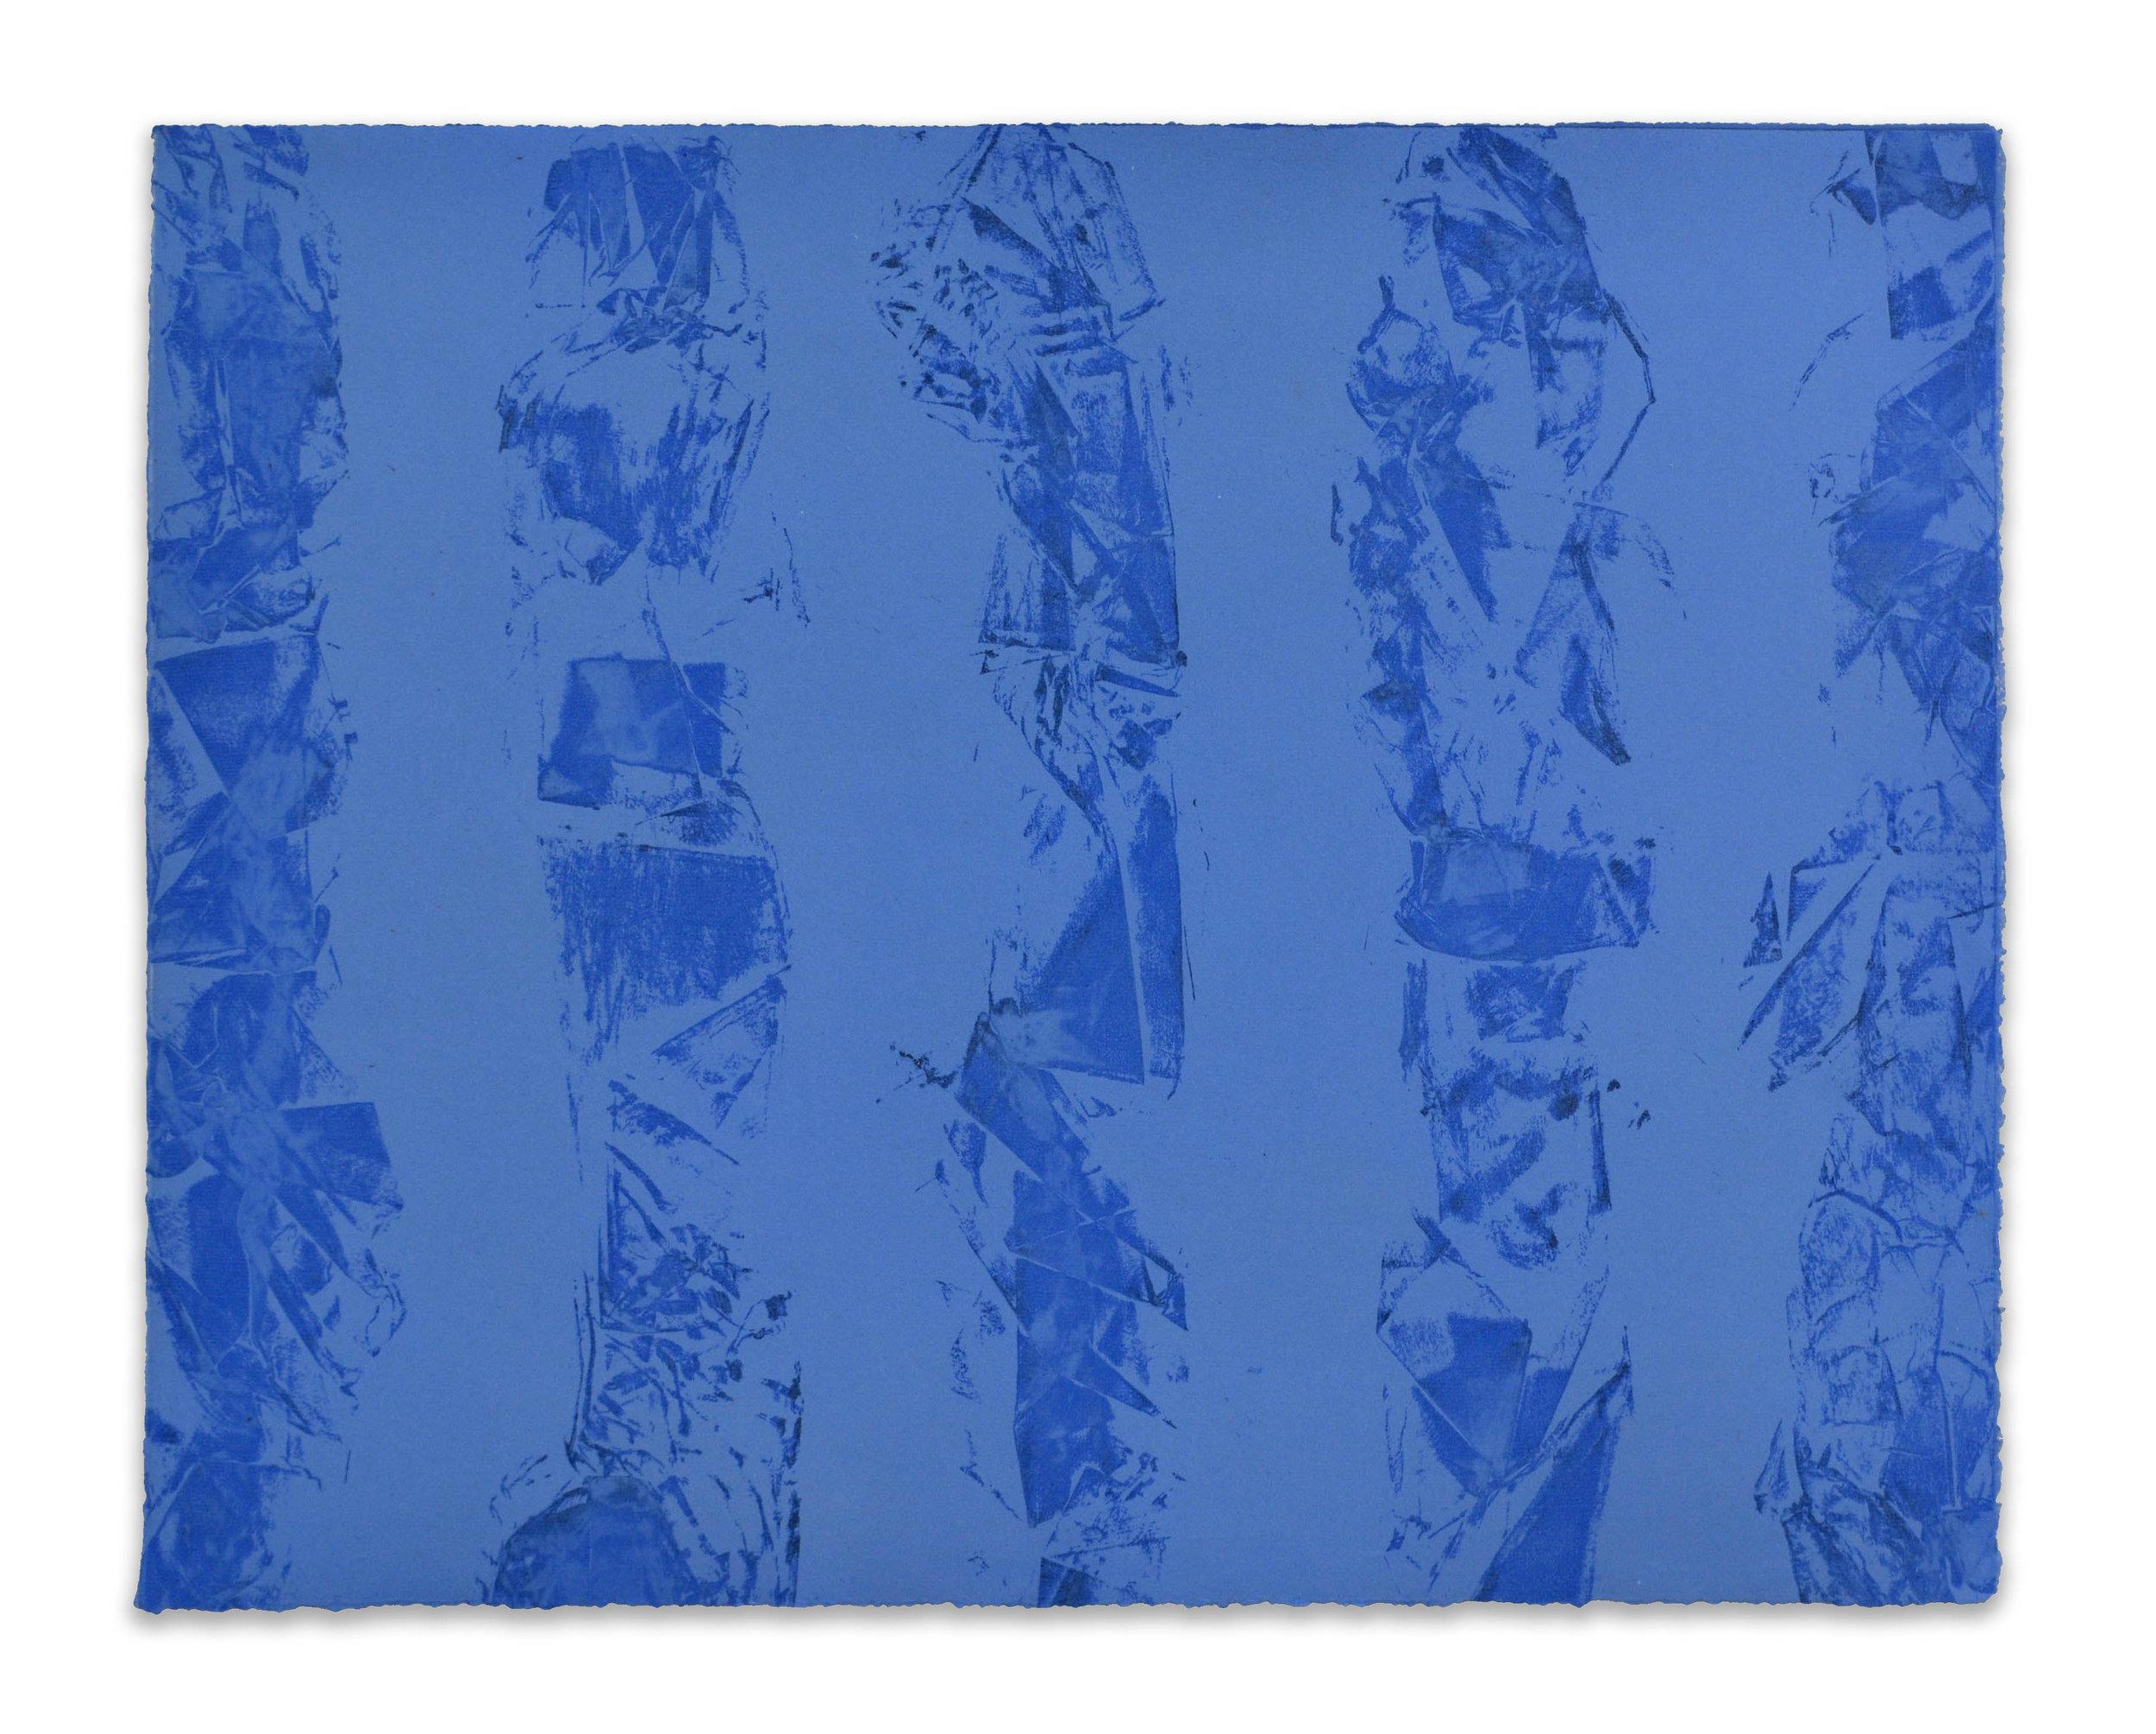 Flowing  - 2018  Incisione su carta PA  37,6 x 48,3 cm